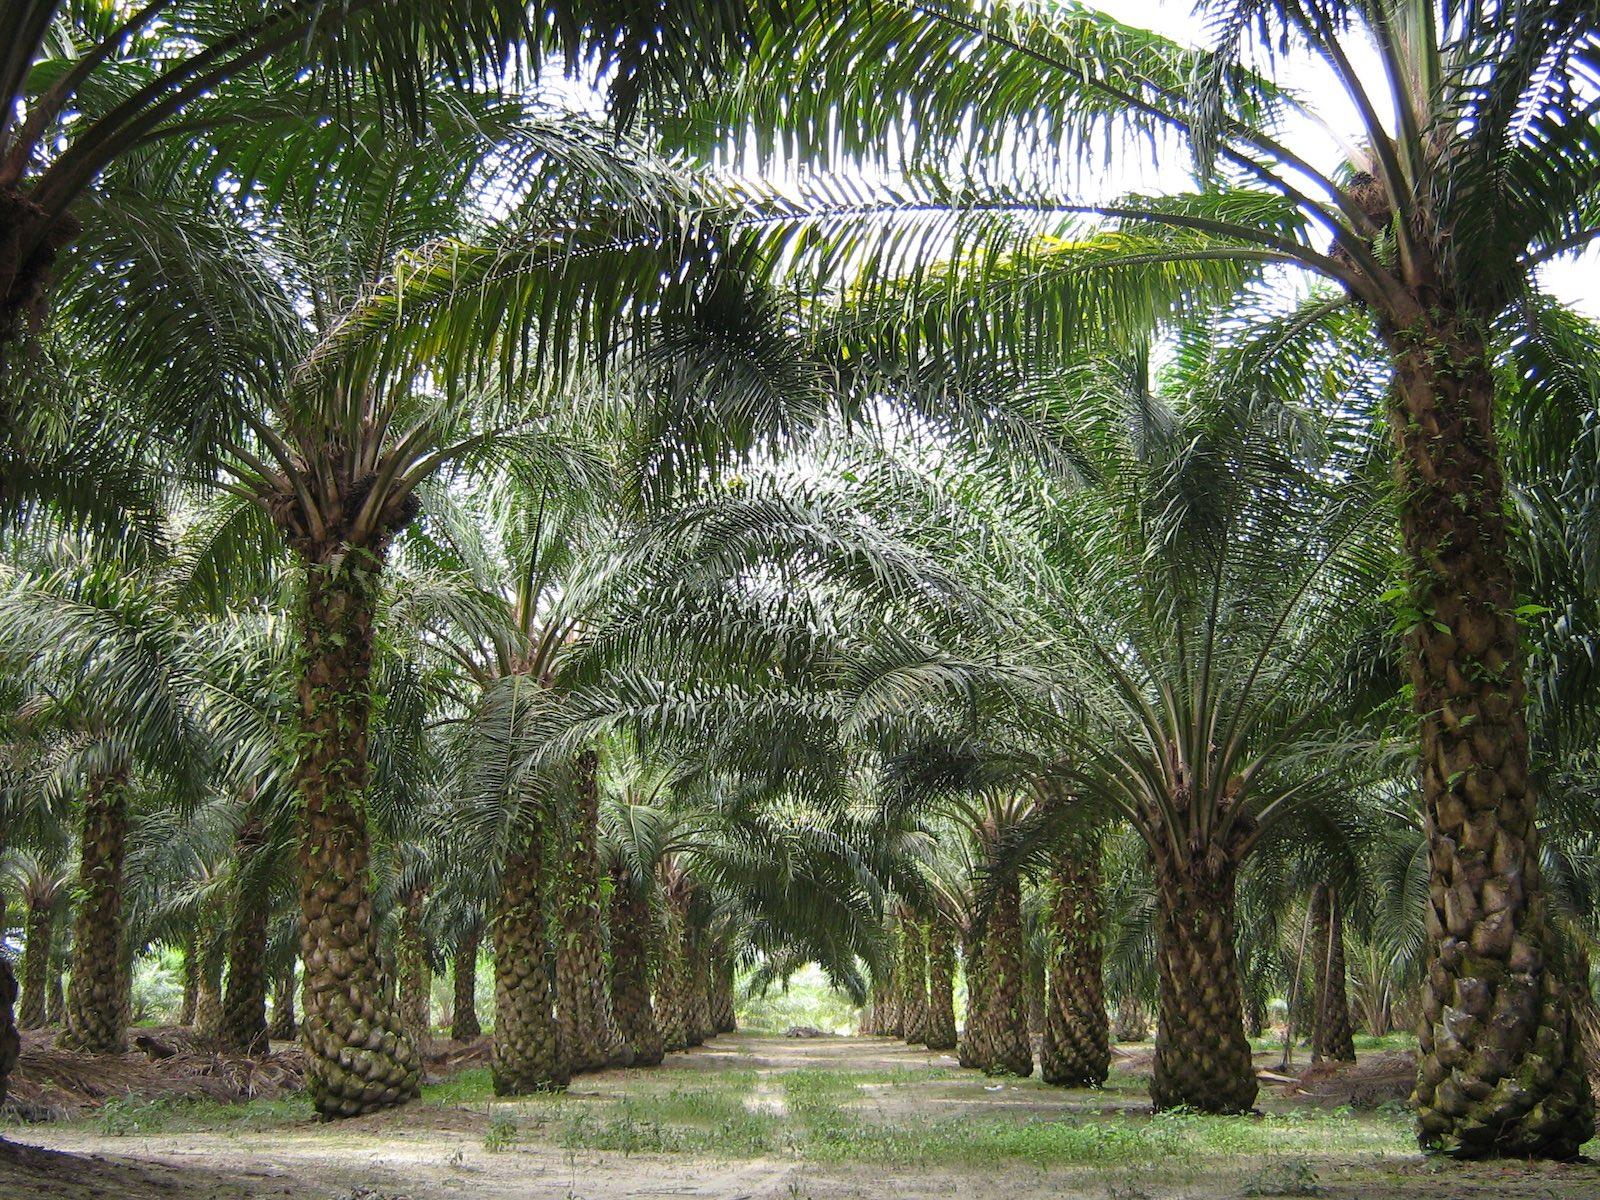 Desde Bucaramanga se buscan nuevos destinos. Mercados mundiales para palma de aceite | EL FRENTE